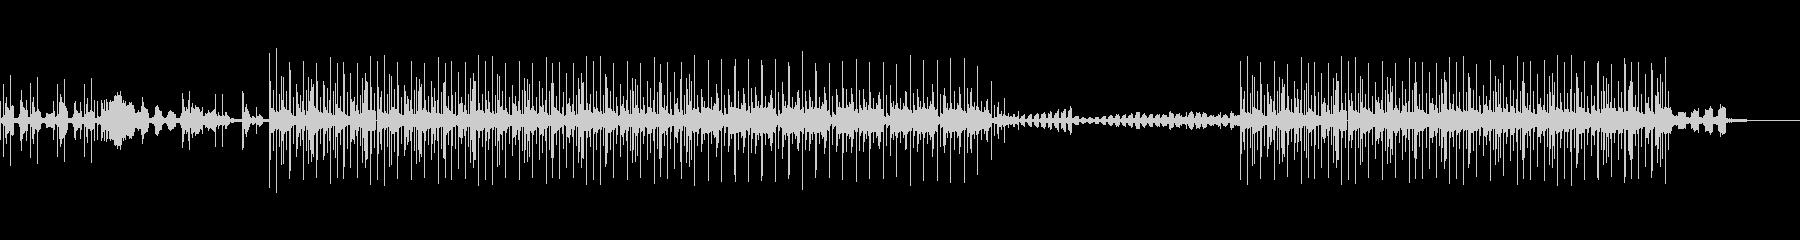 lofibeats 12月27日6曲目の未再生の波形